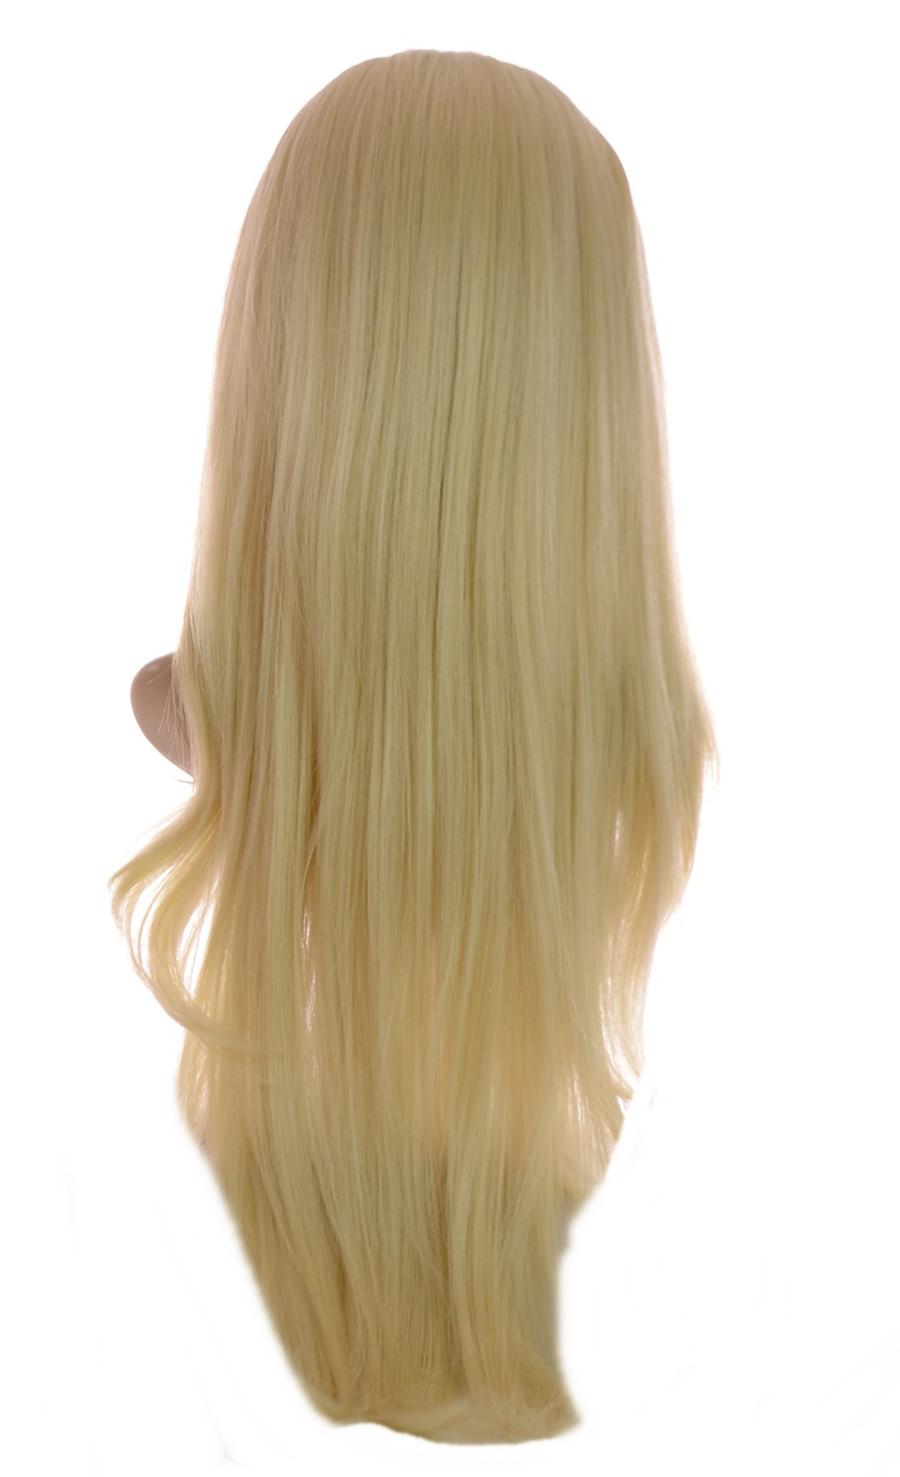 V Tress Weft Hair Extension Monroe Blonde